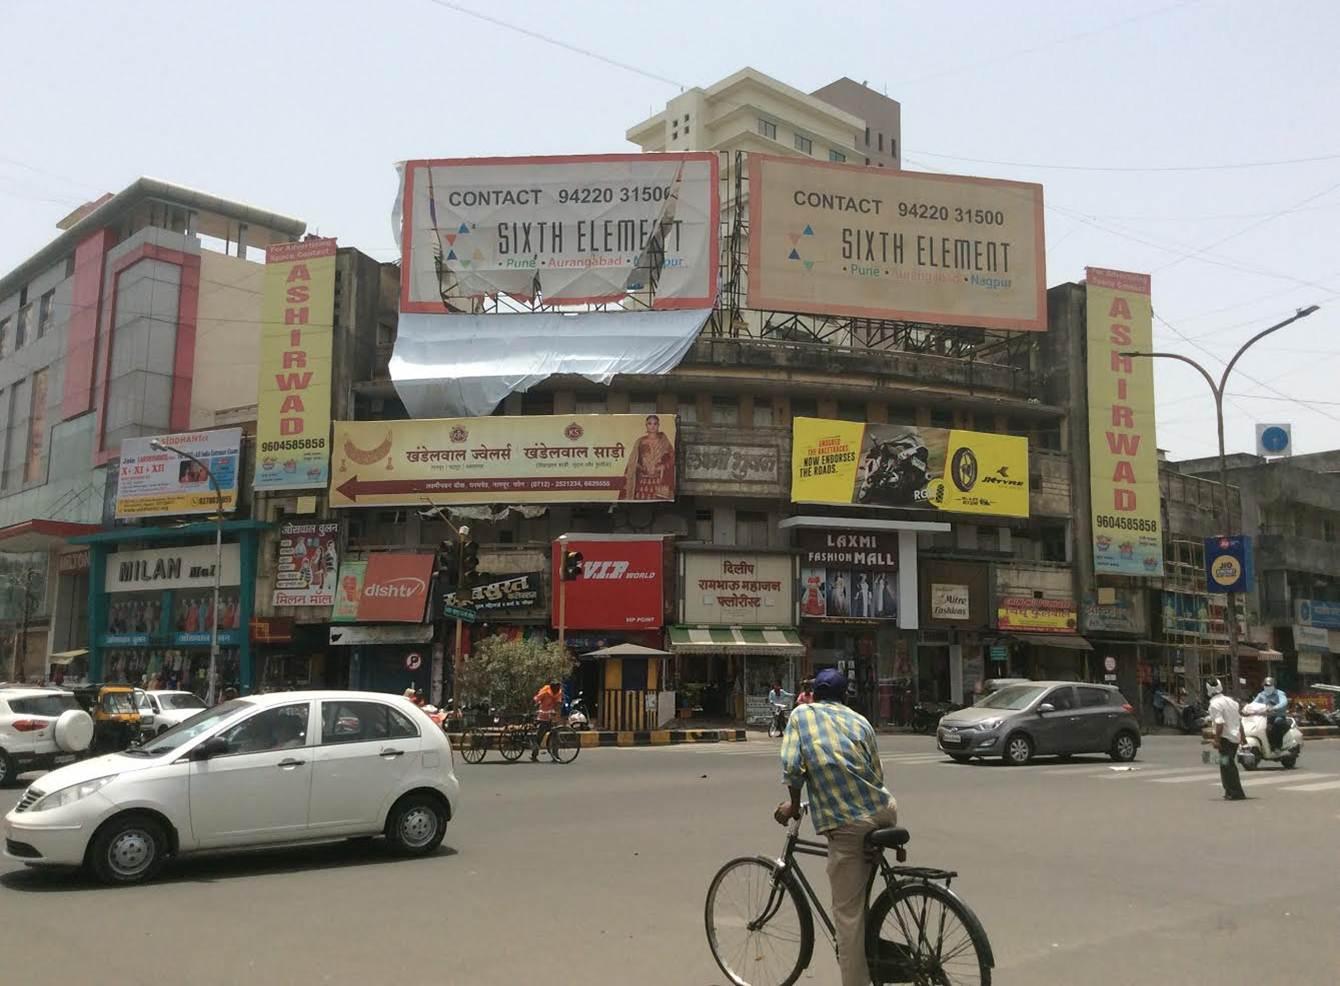 Laxmi Bhuvan Whc Road Dharampeth, Nagpur